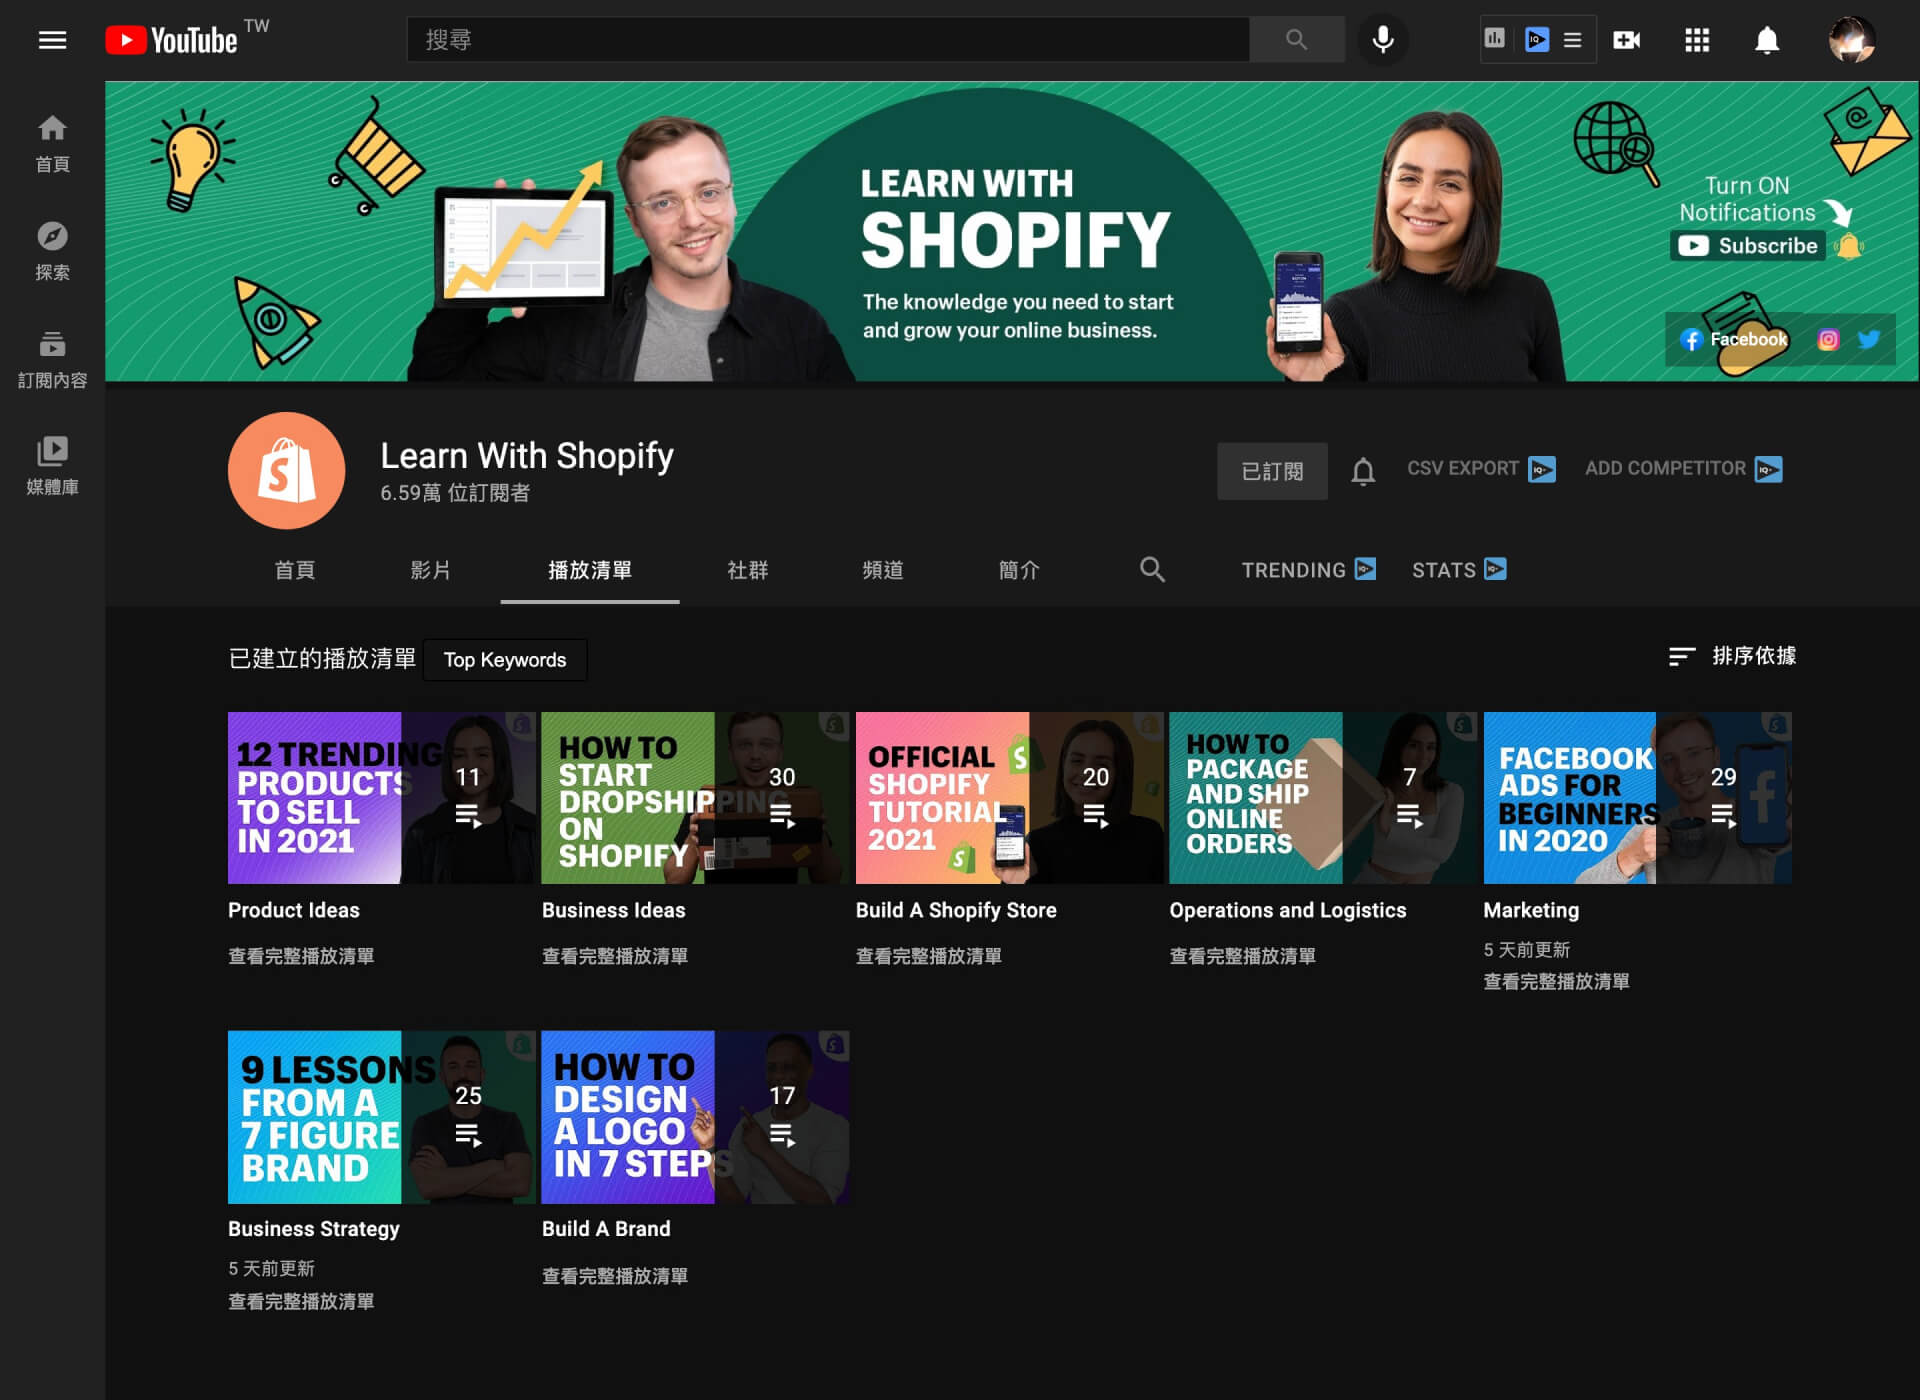 Learn With Shopify-直接觀看 Shopify 官方 YouTube 影片頻道學習-IrvingLab 爾文實驗室